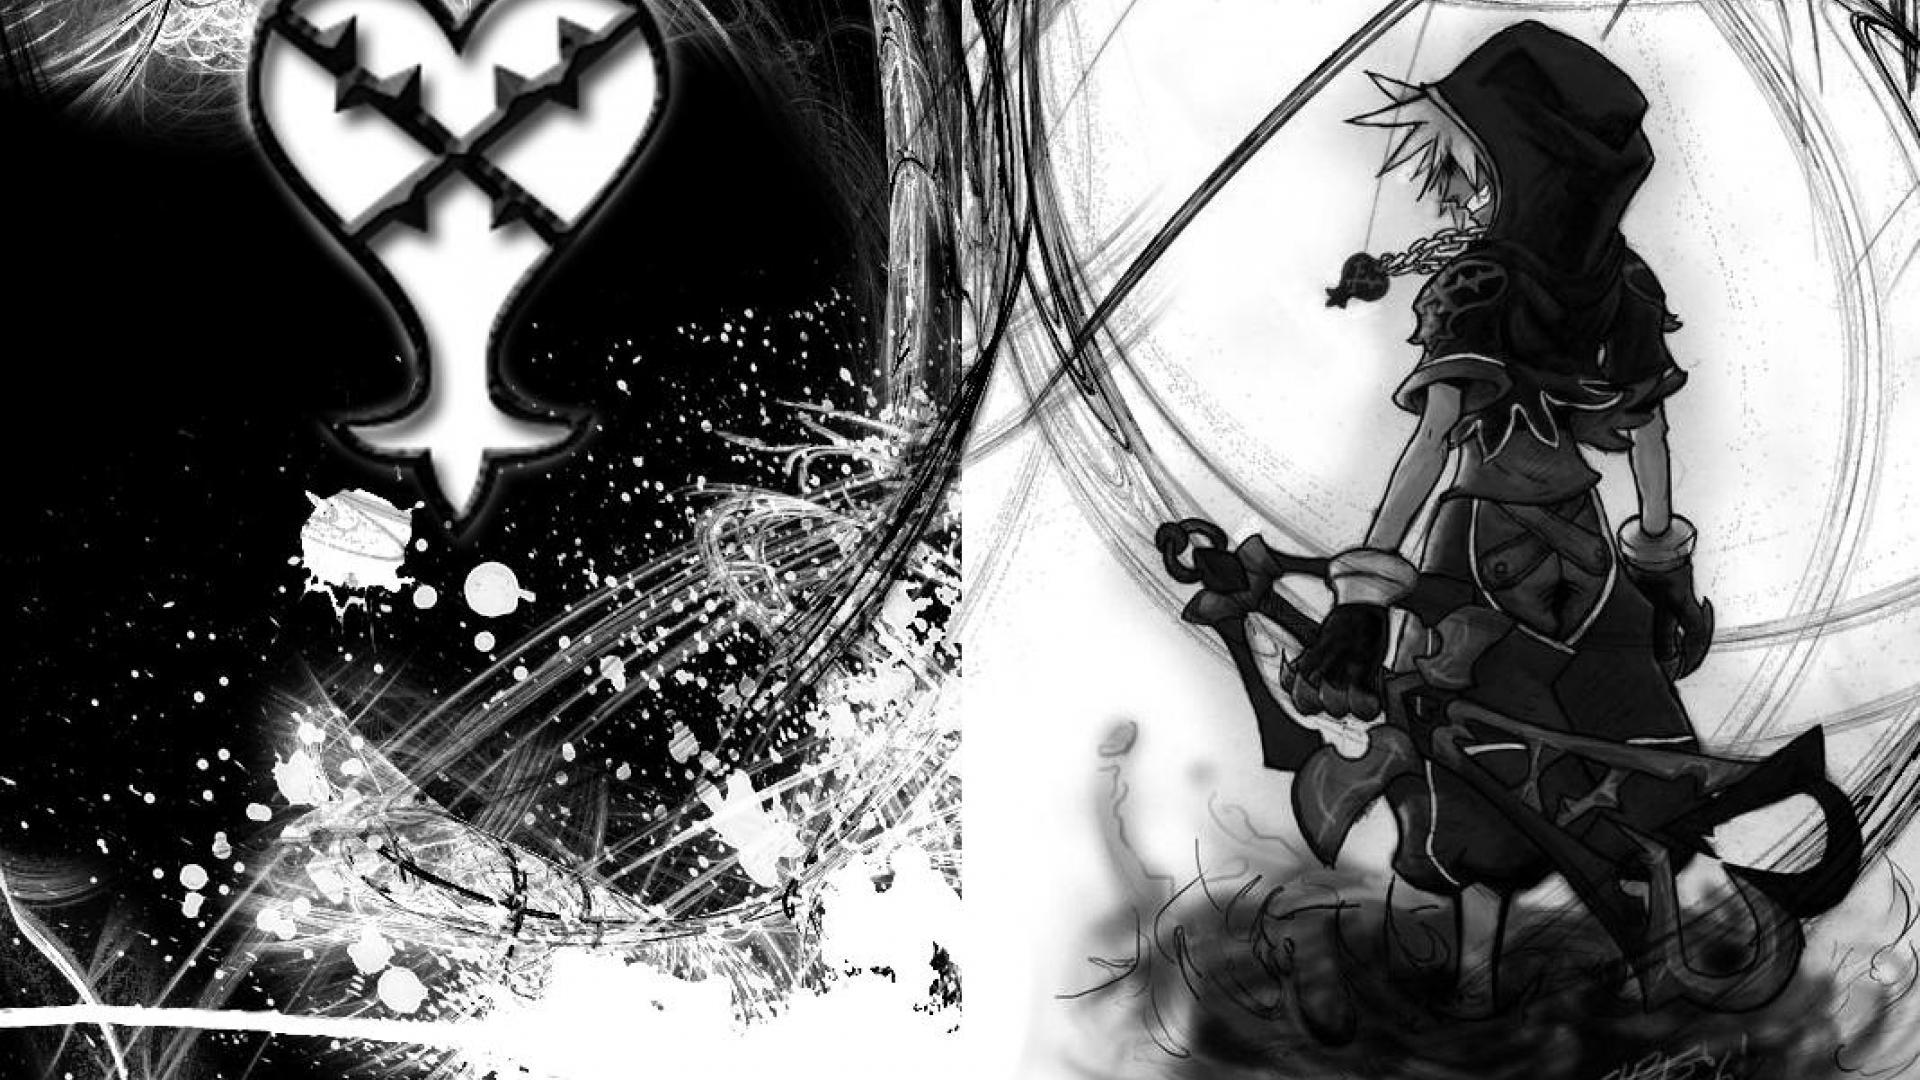 30 Beautiful Kingdom Hearts Wallpapers Hd Widescreen